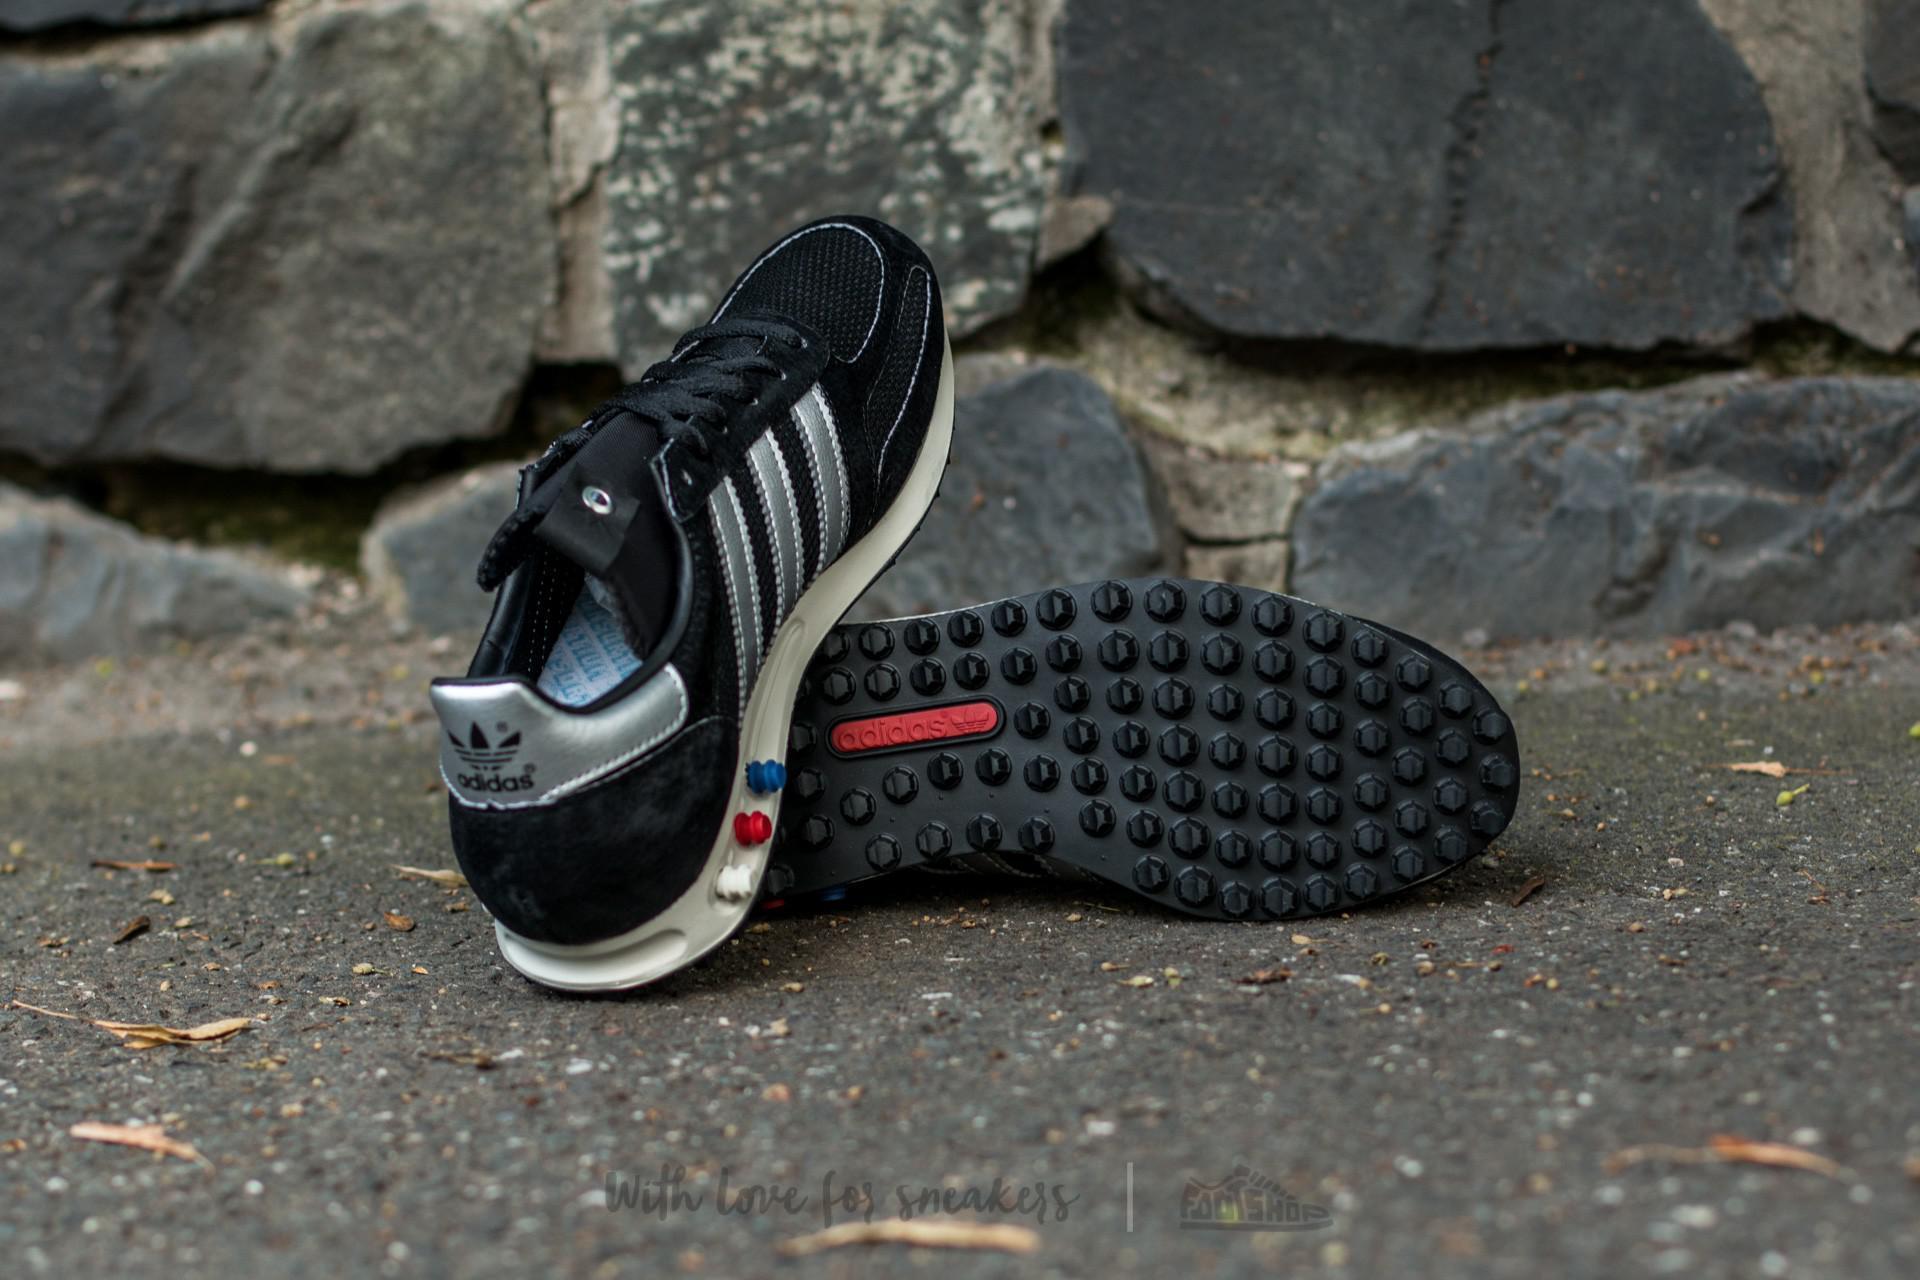 b0c7025e9ac66e Lyst - Footshop Adidas La Trainer Og Made In Germany Core Black ...